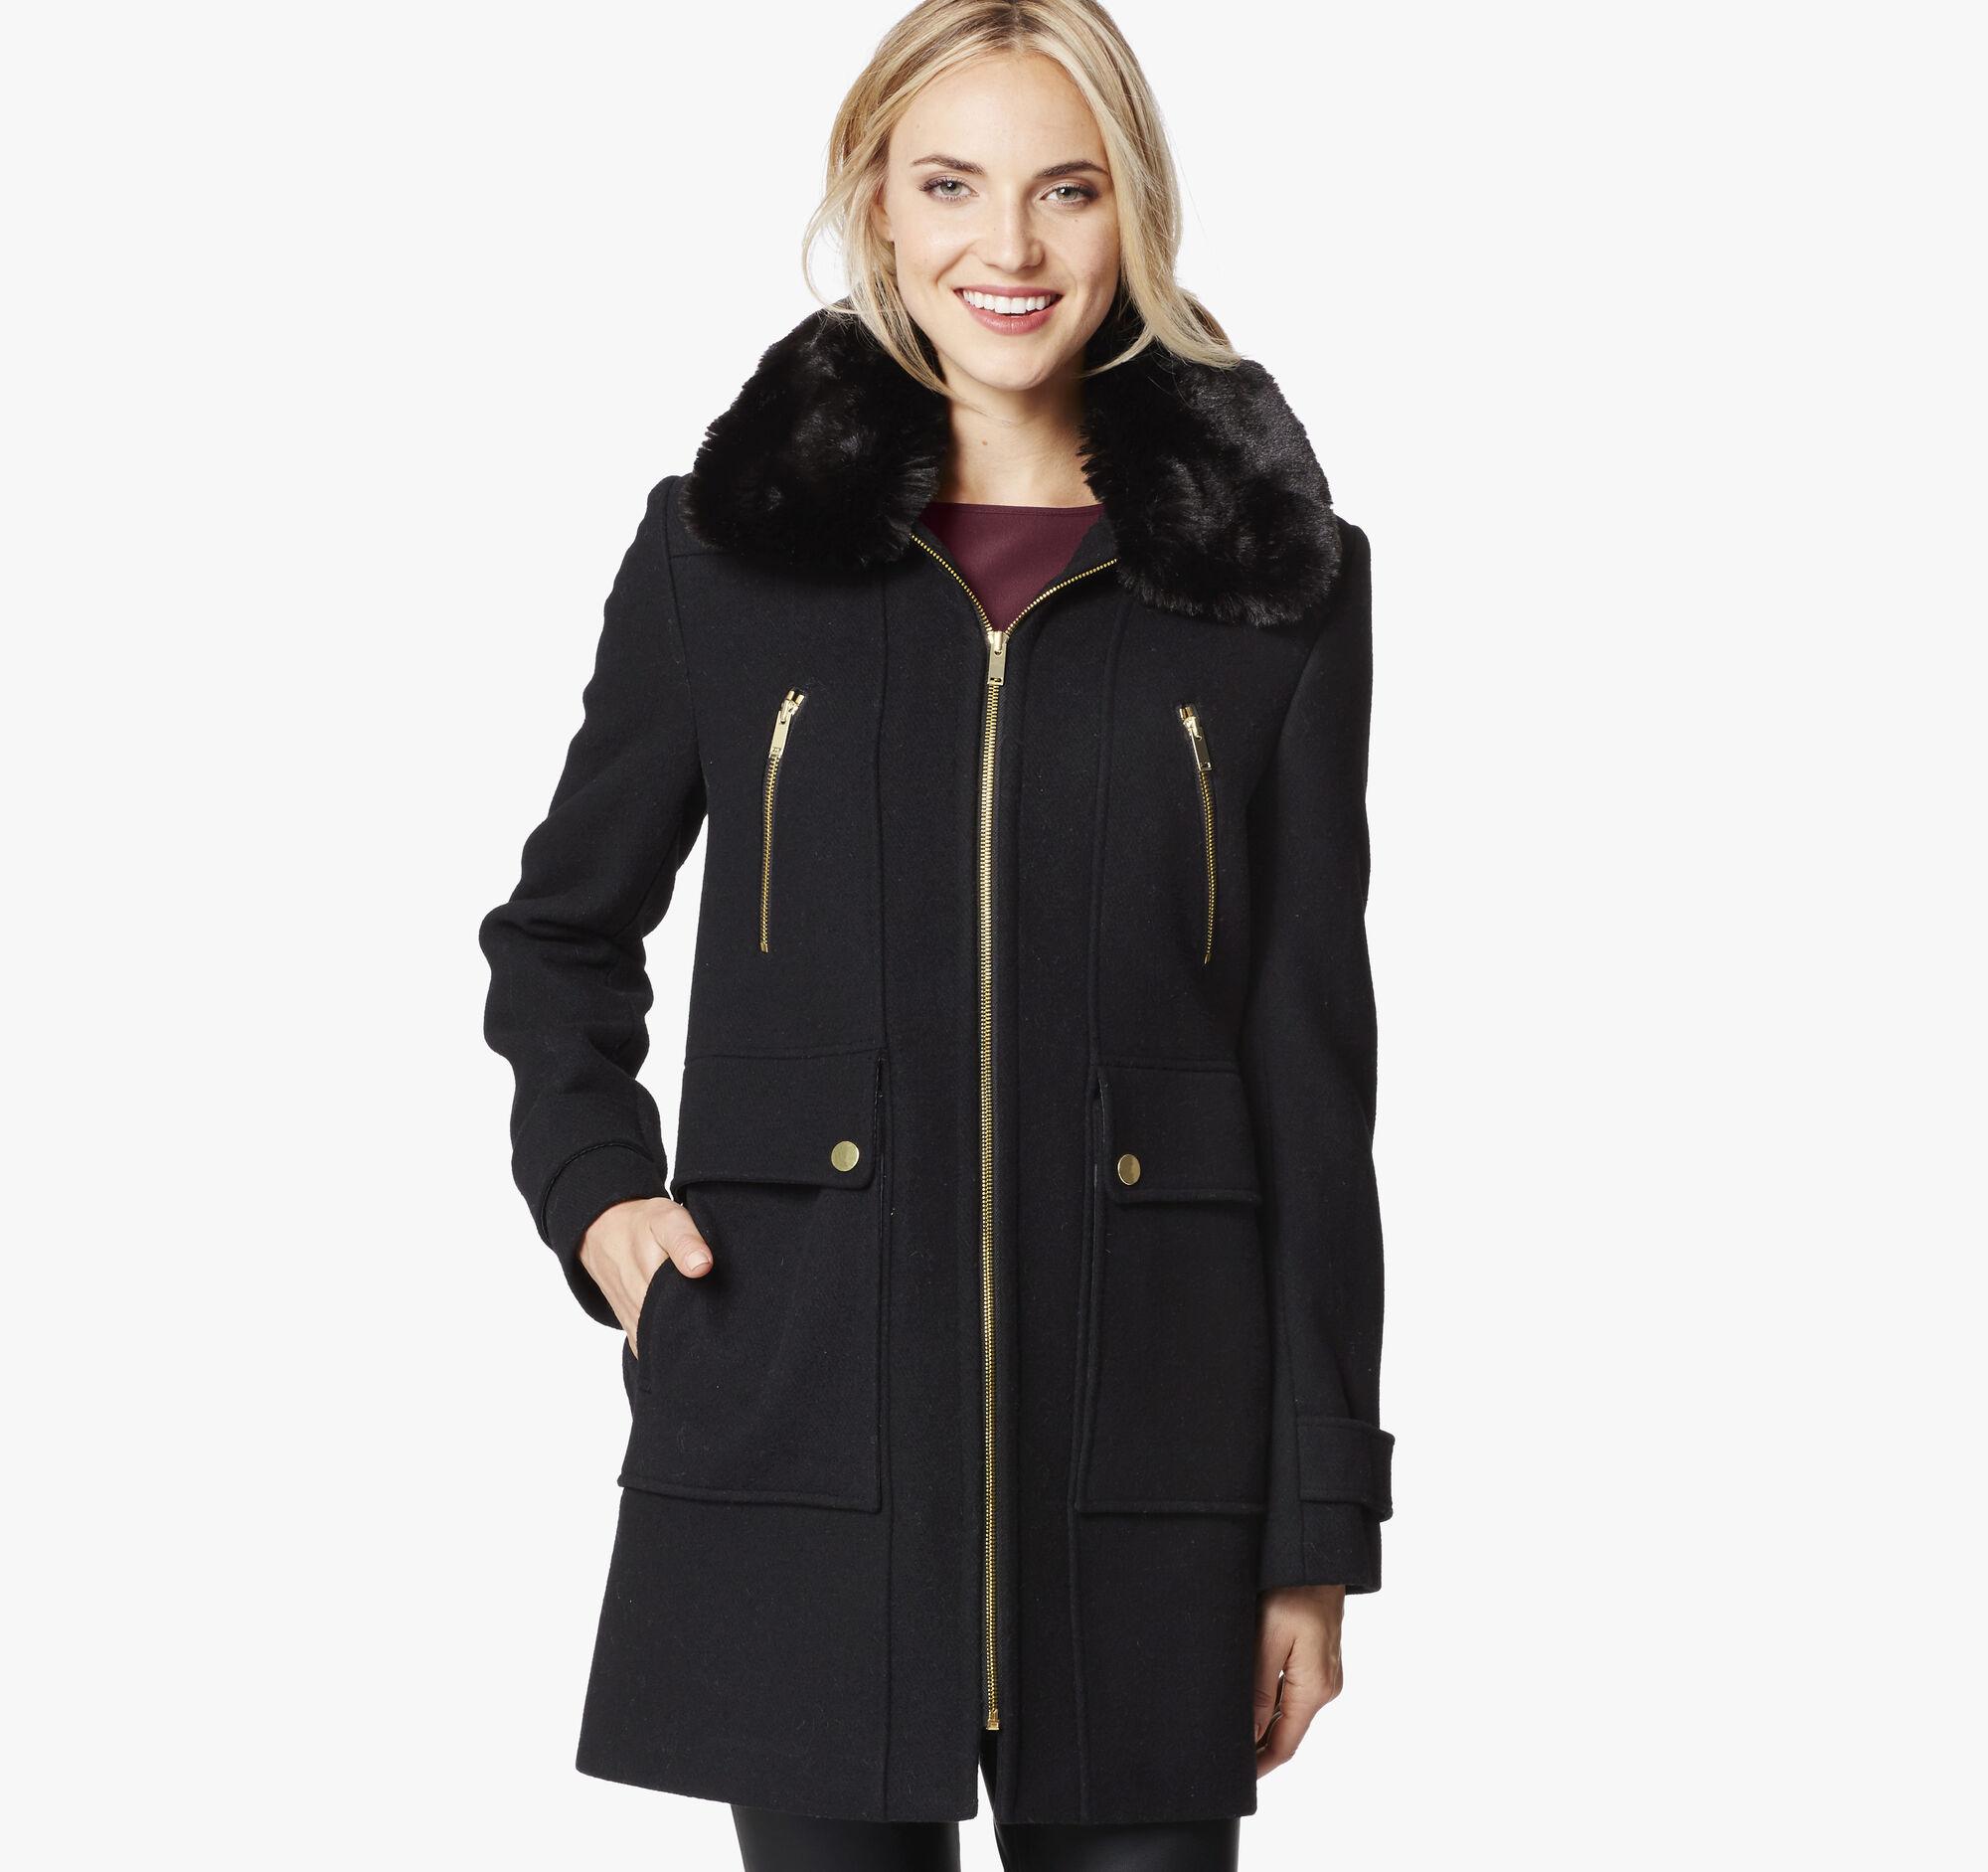 Hooded Wool Coat With Fur Collar Johnston Amp Murphy